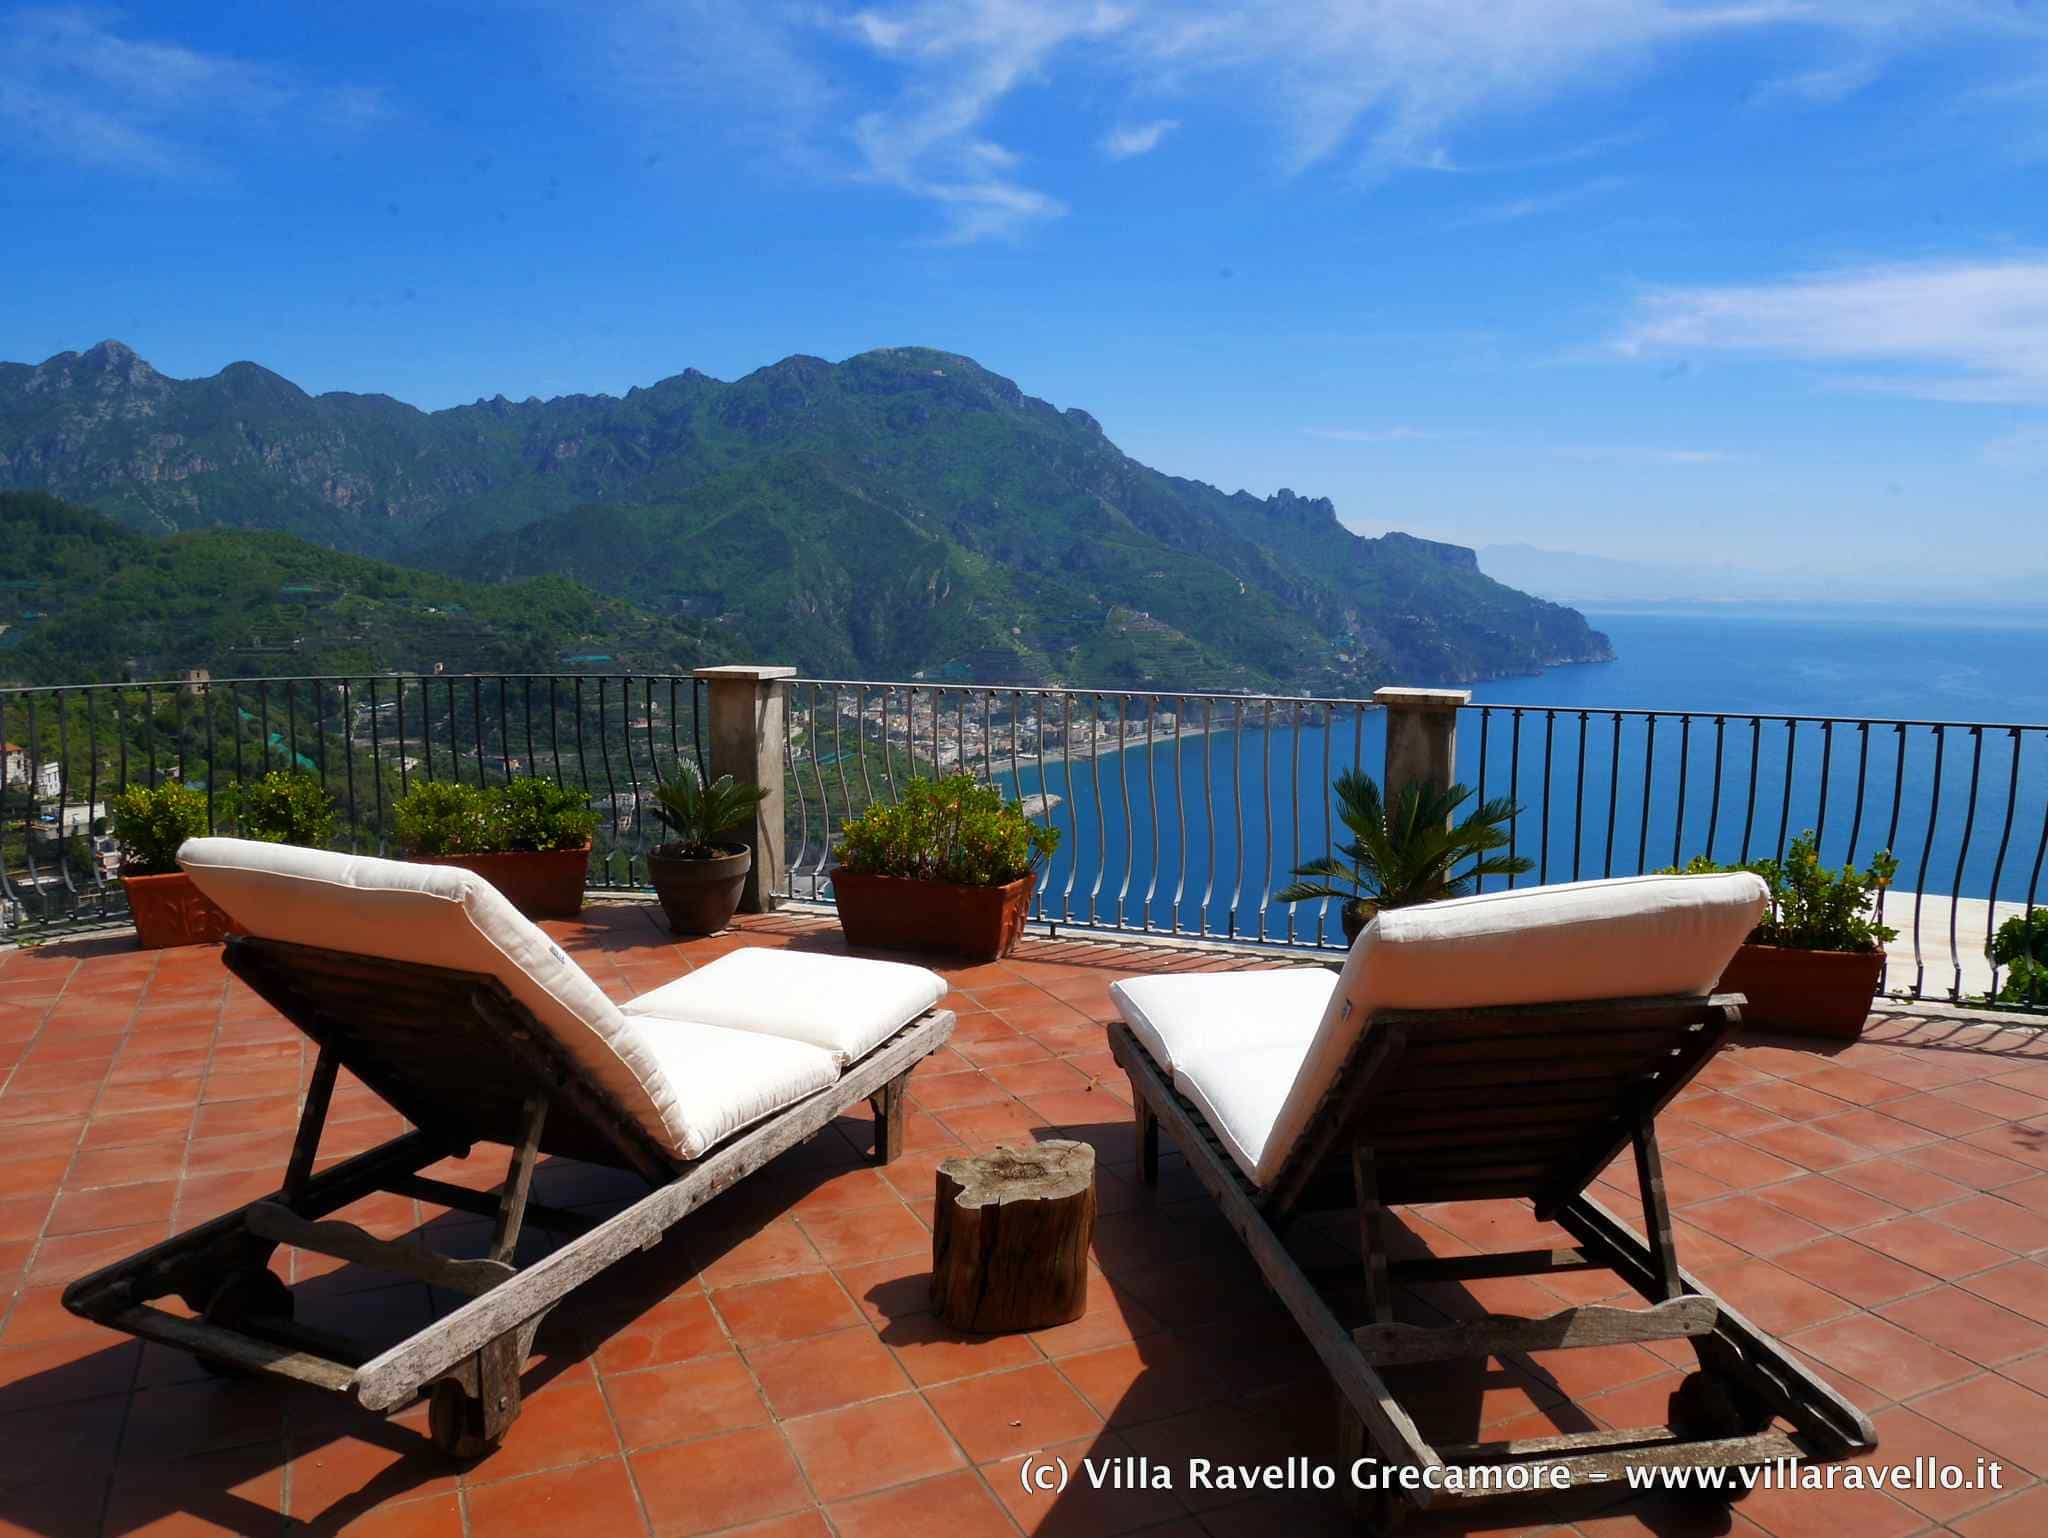 Villa Ravello Grecamore - relax on the terrace